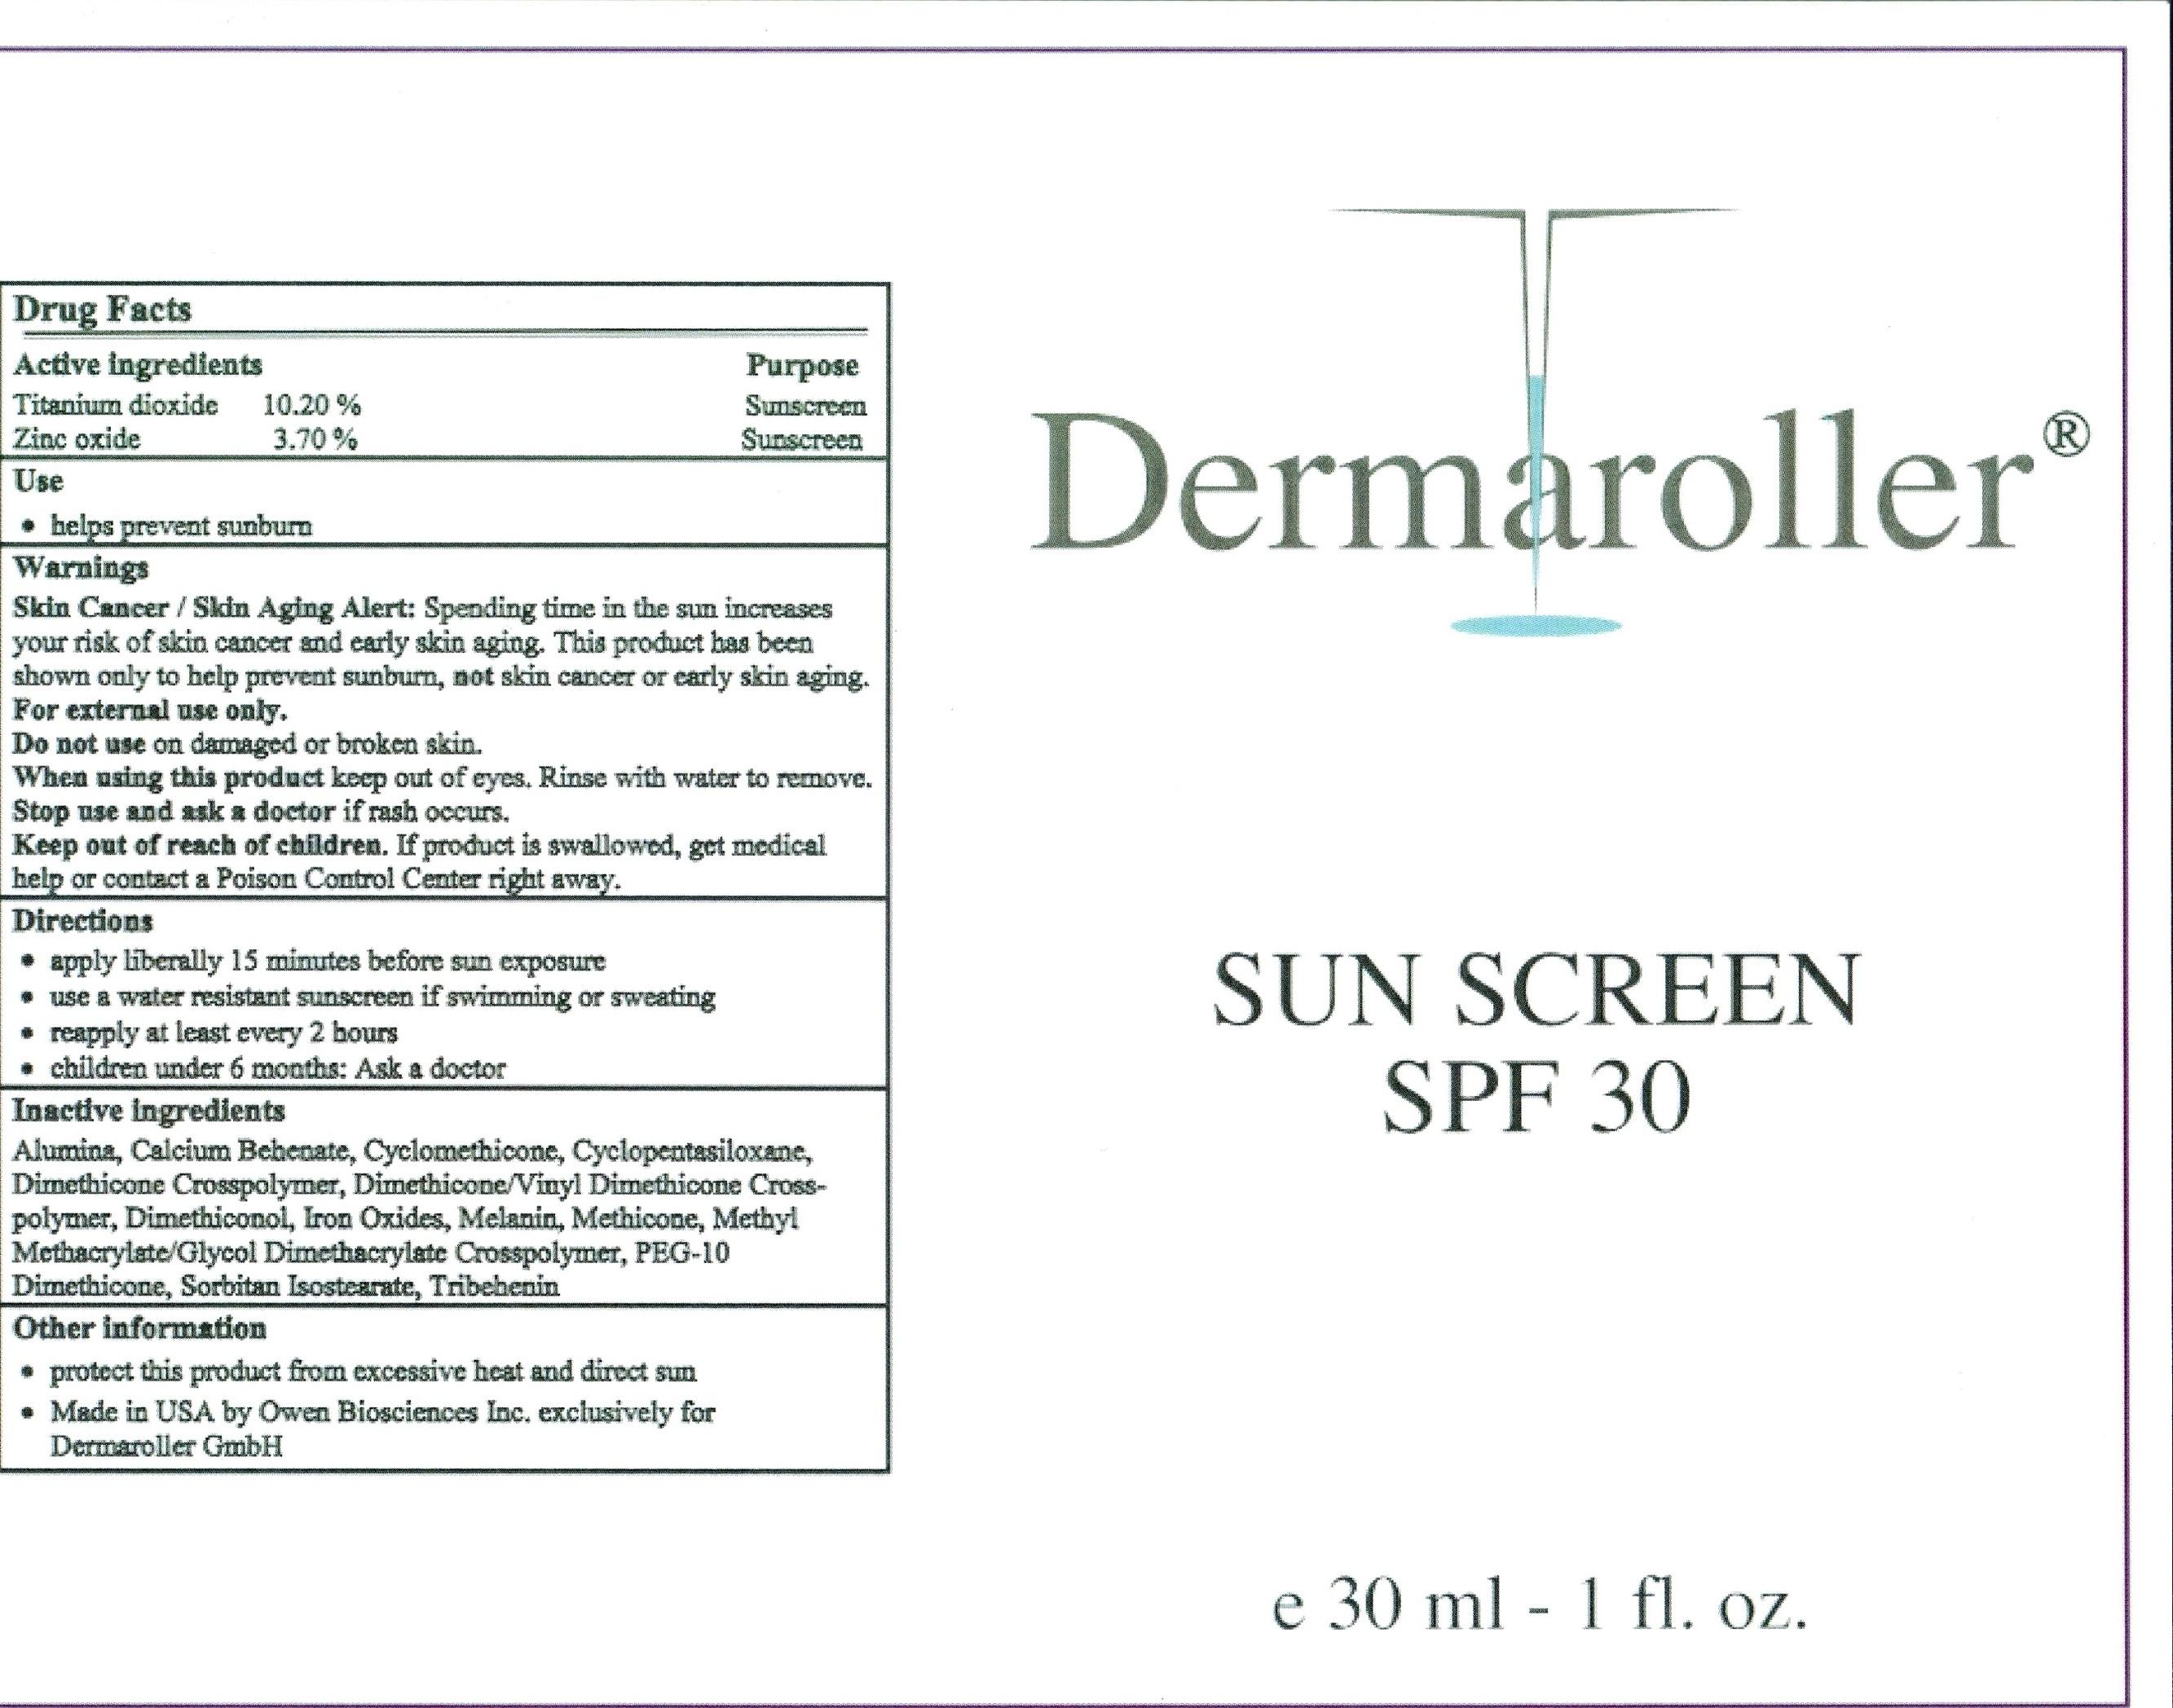 Dermaroller Anhydrous Sunscreen Spf 30 (Titanium Dioxide, Zinc Oxide) Cream [Owen Biosciences, Inc.]